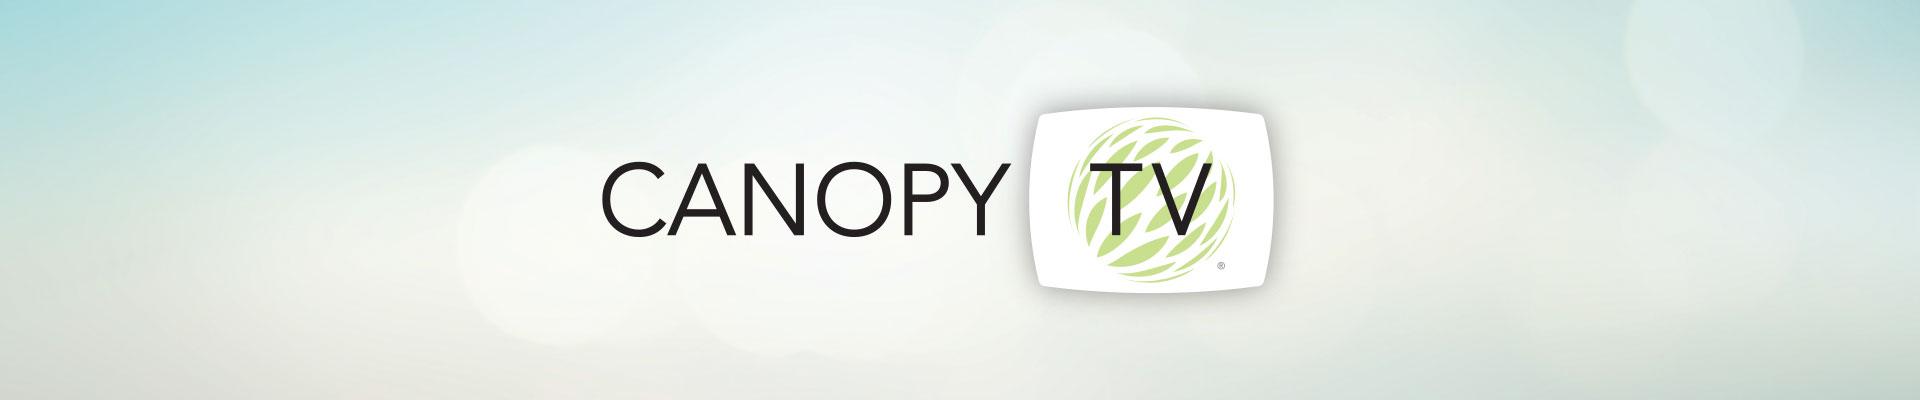 Canopy TV